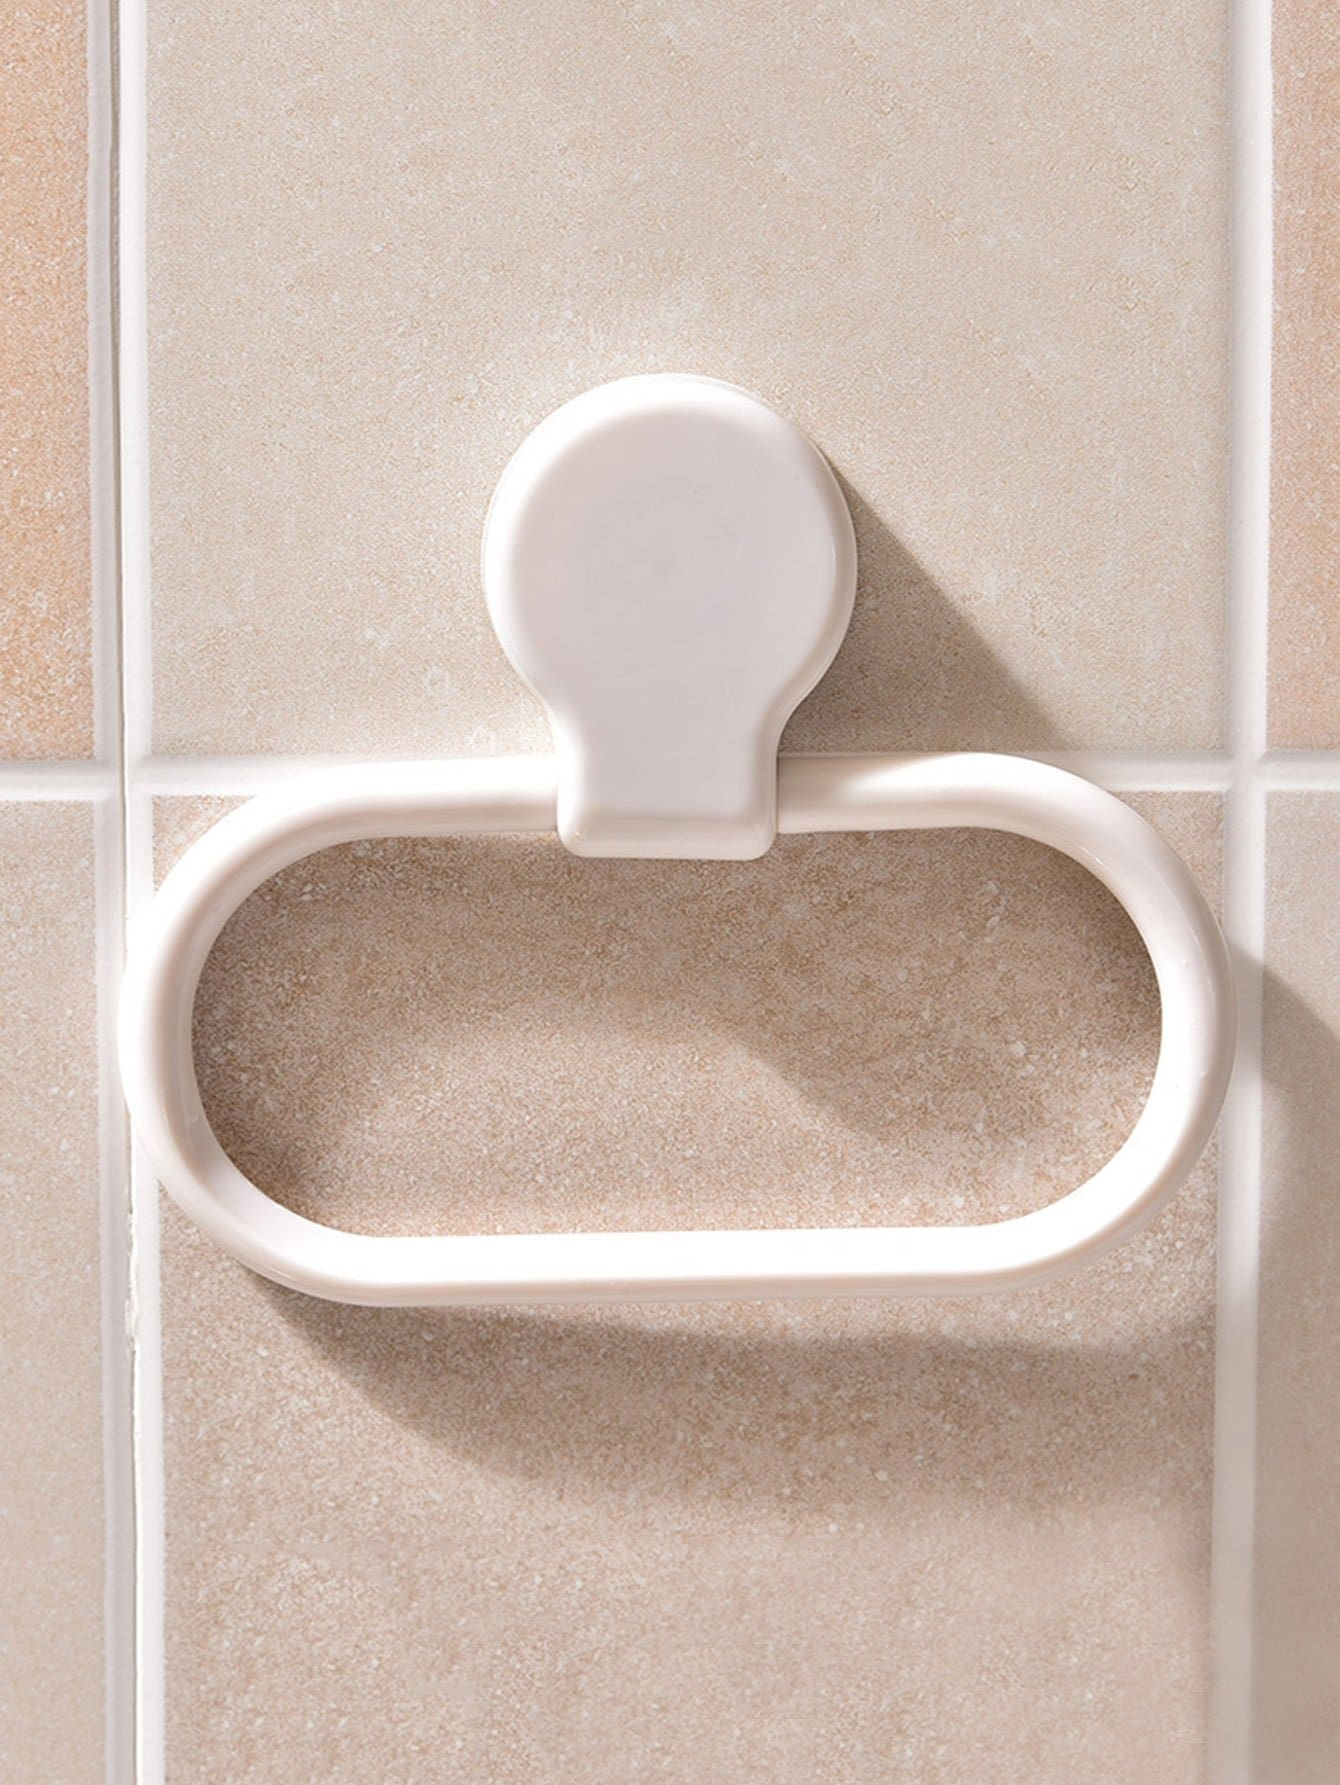 Wall Mounted Towel Ring bathroom accessory wall mounted black oil rubbed brass bath towel ring towel rack holder aba856